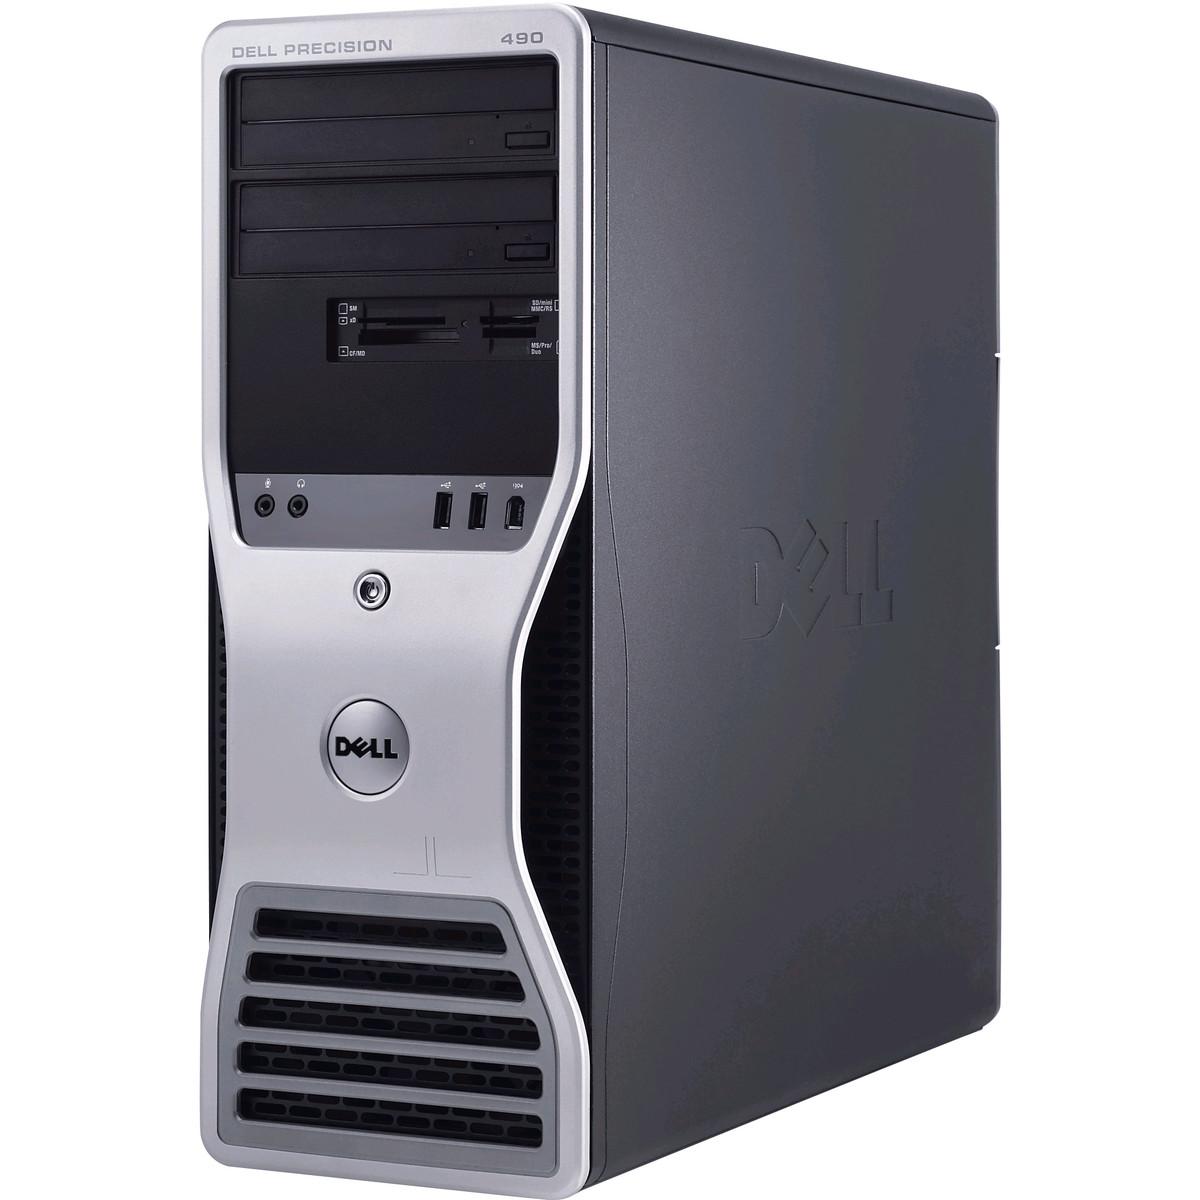 Calculator second hand Precision 490 2 x Xeon 5130 2.0GHz 4GB DDR2 320GB ( 160x160GB) DVD NVIDA QUADRO FX580 Tower